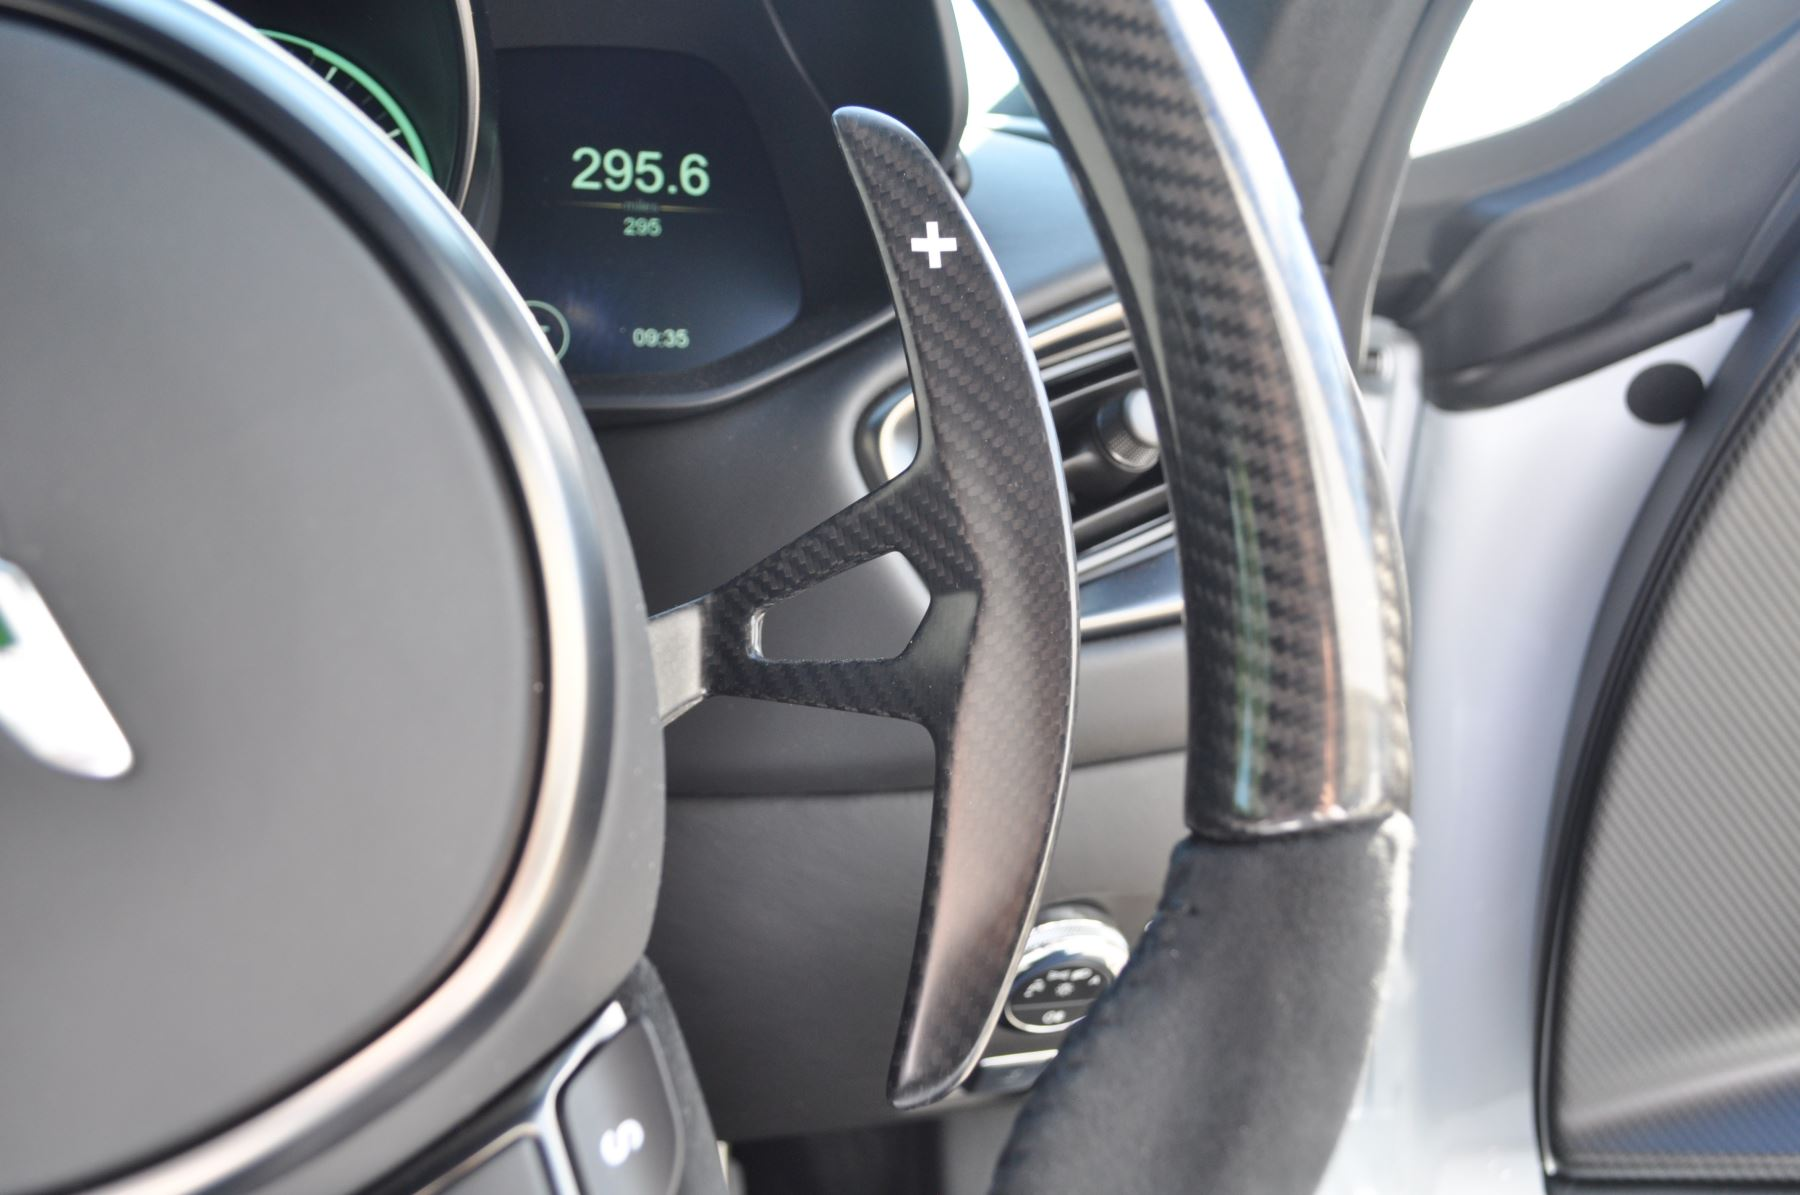 Aston Martin DBS V12 Superleggera 2dr Touchtronic image 25